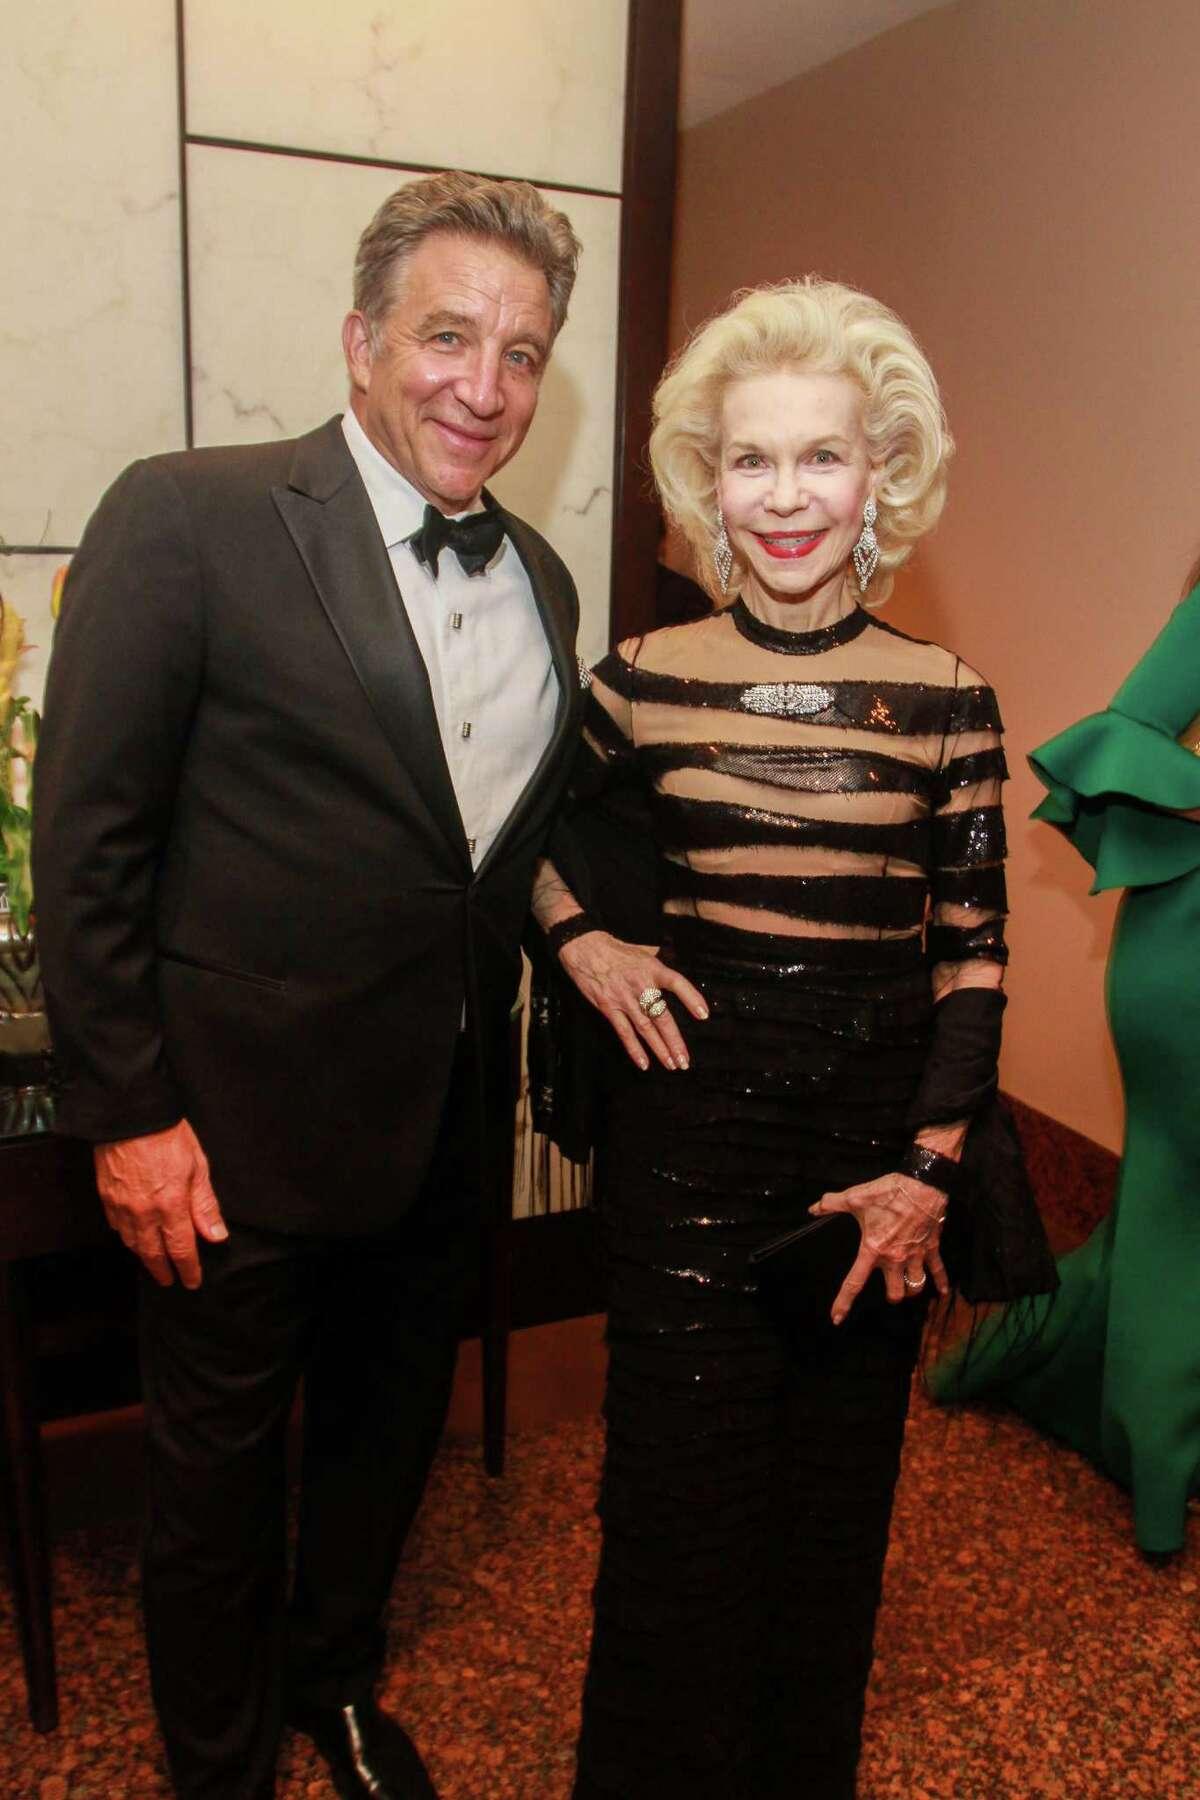 Steven Wyatt and Lynn Wyatt at the Houston Grand Opera re-opening gala.